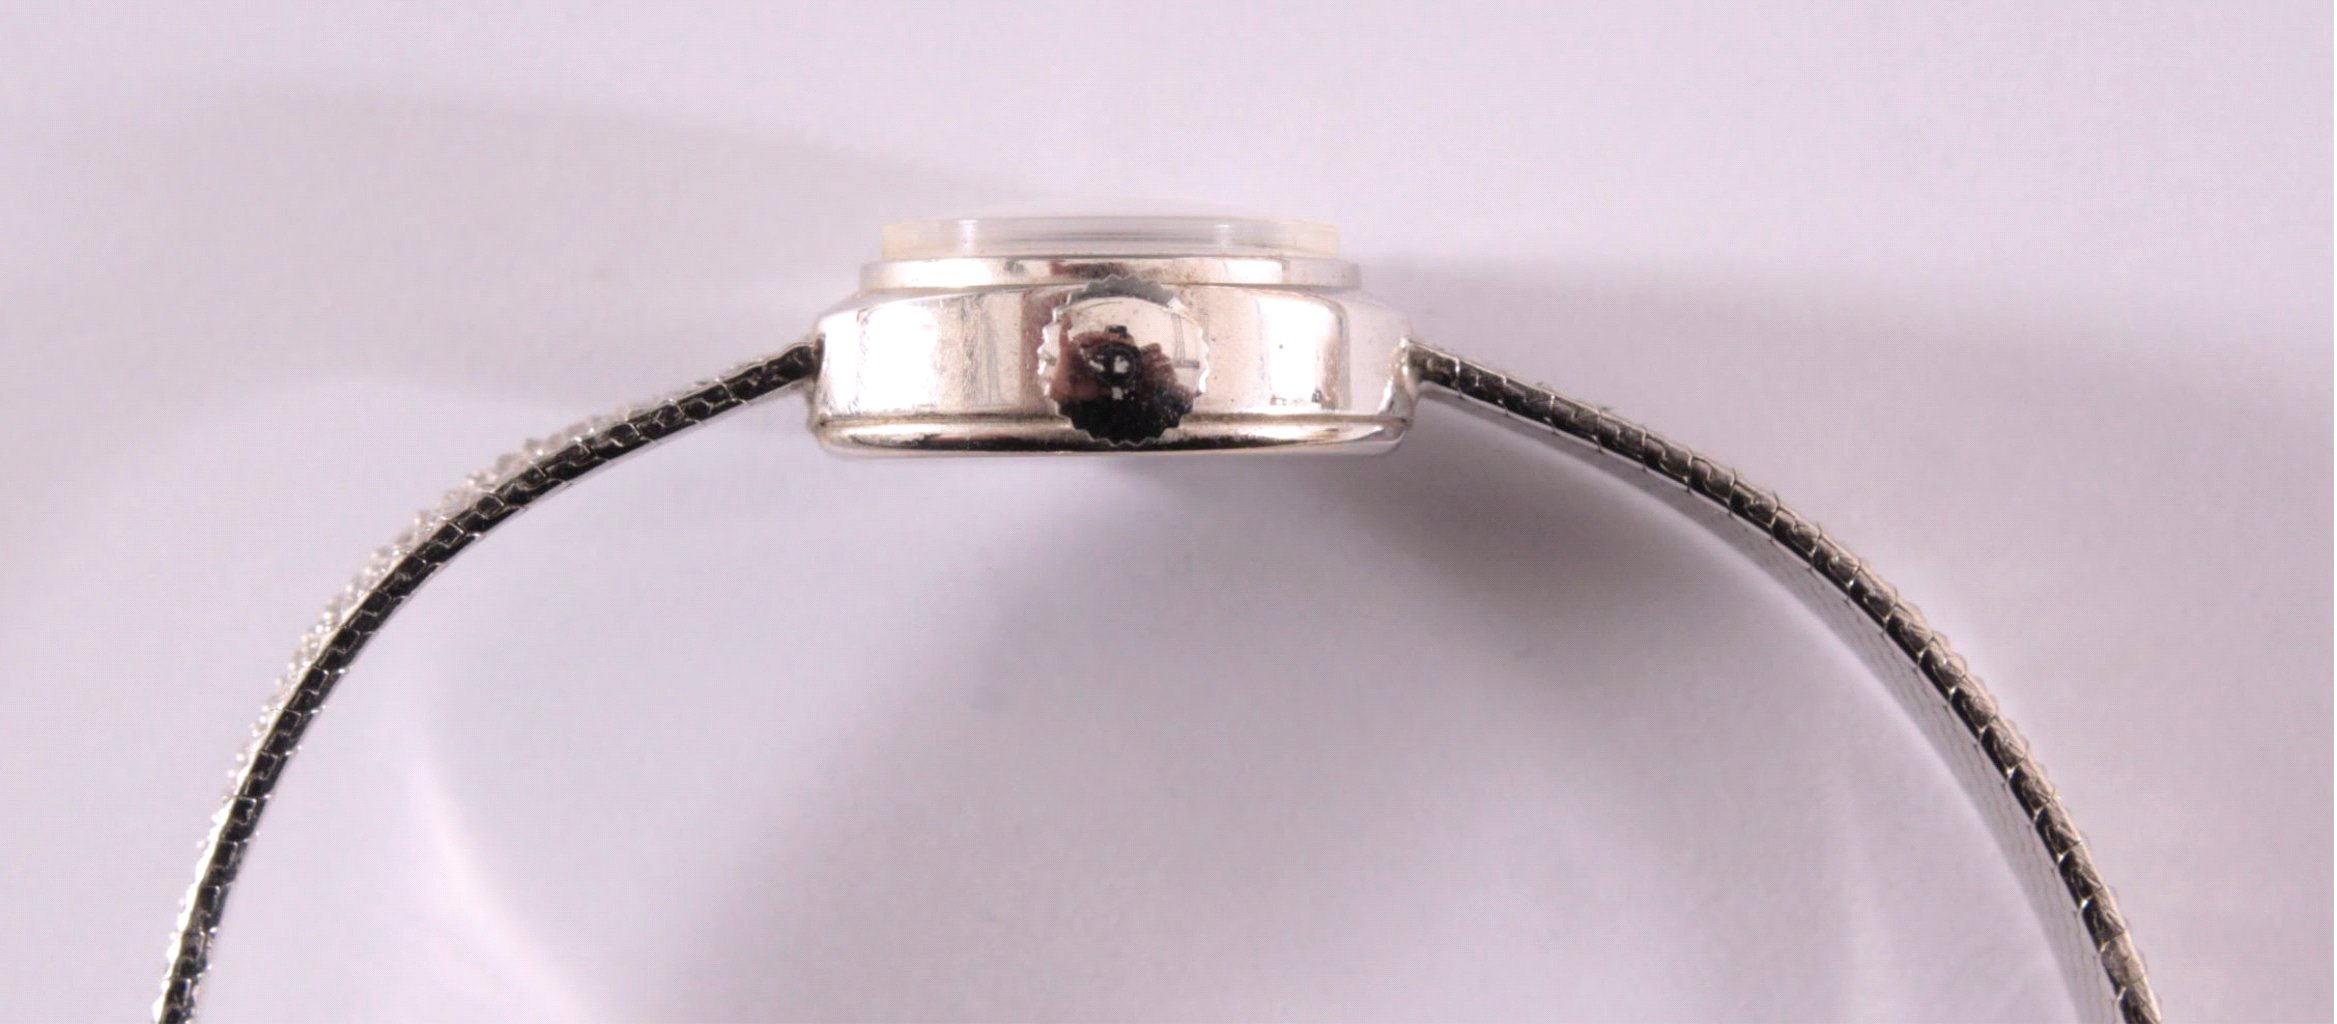 Roxy Anker Damenarmbanduhr, 14 Karat Weißgold-4